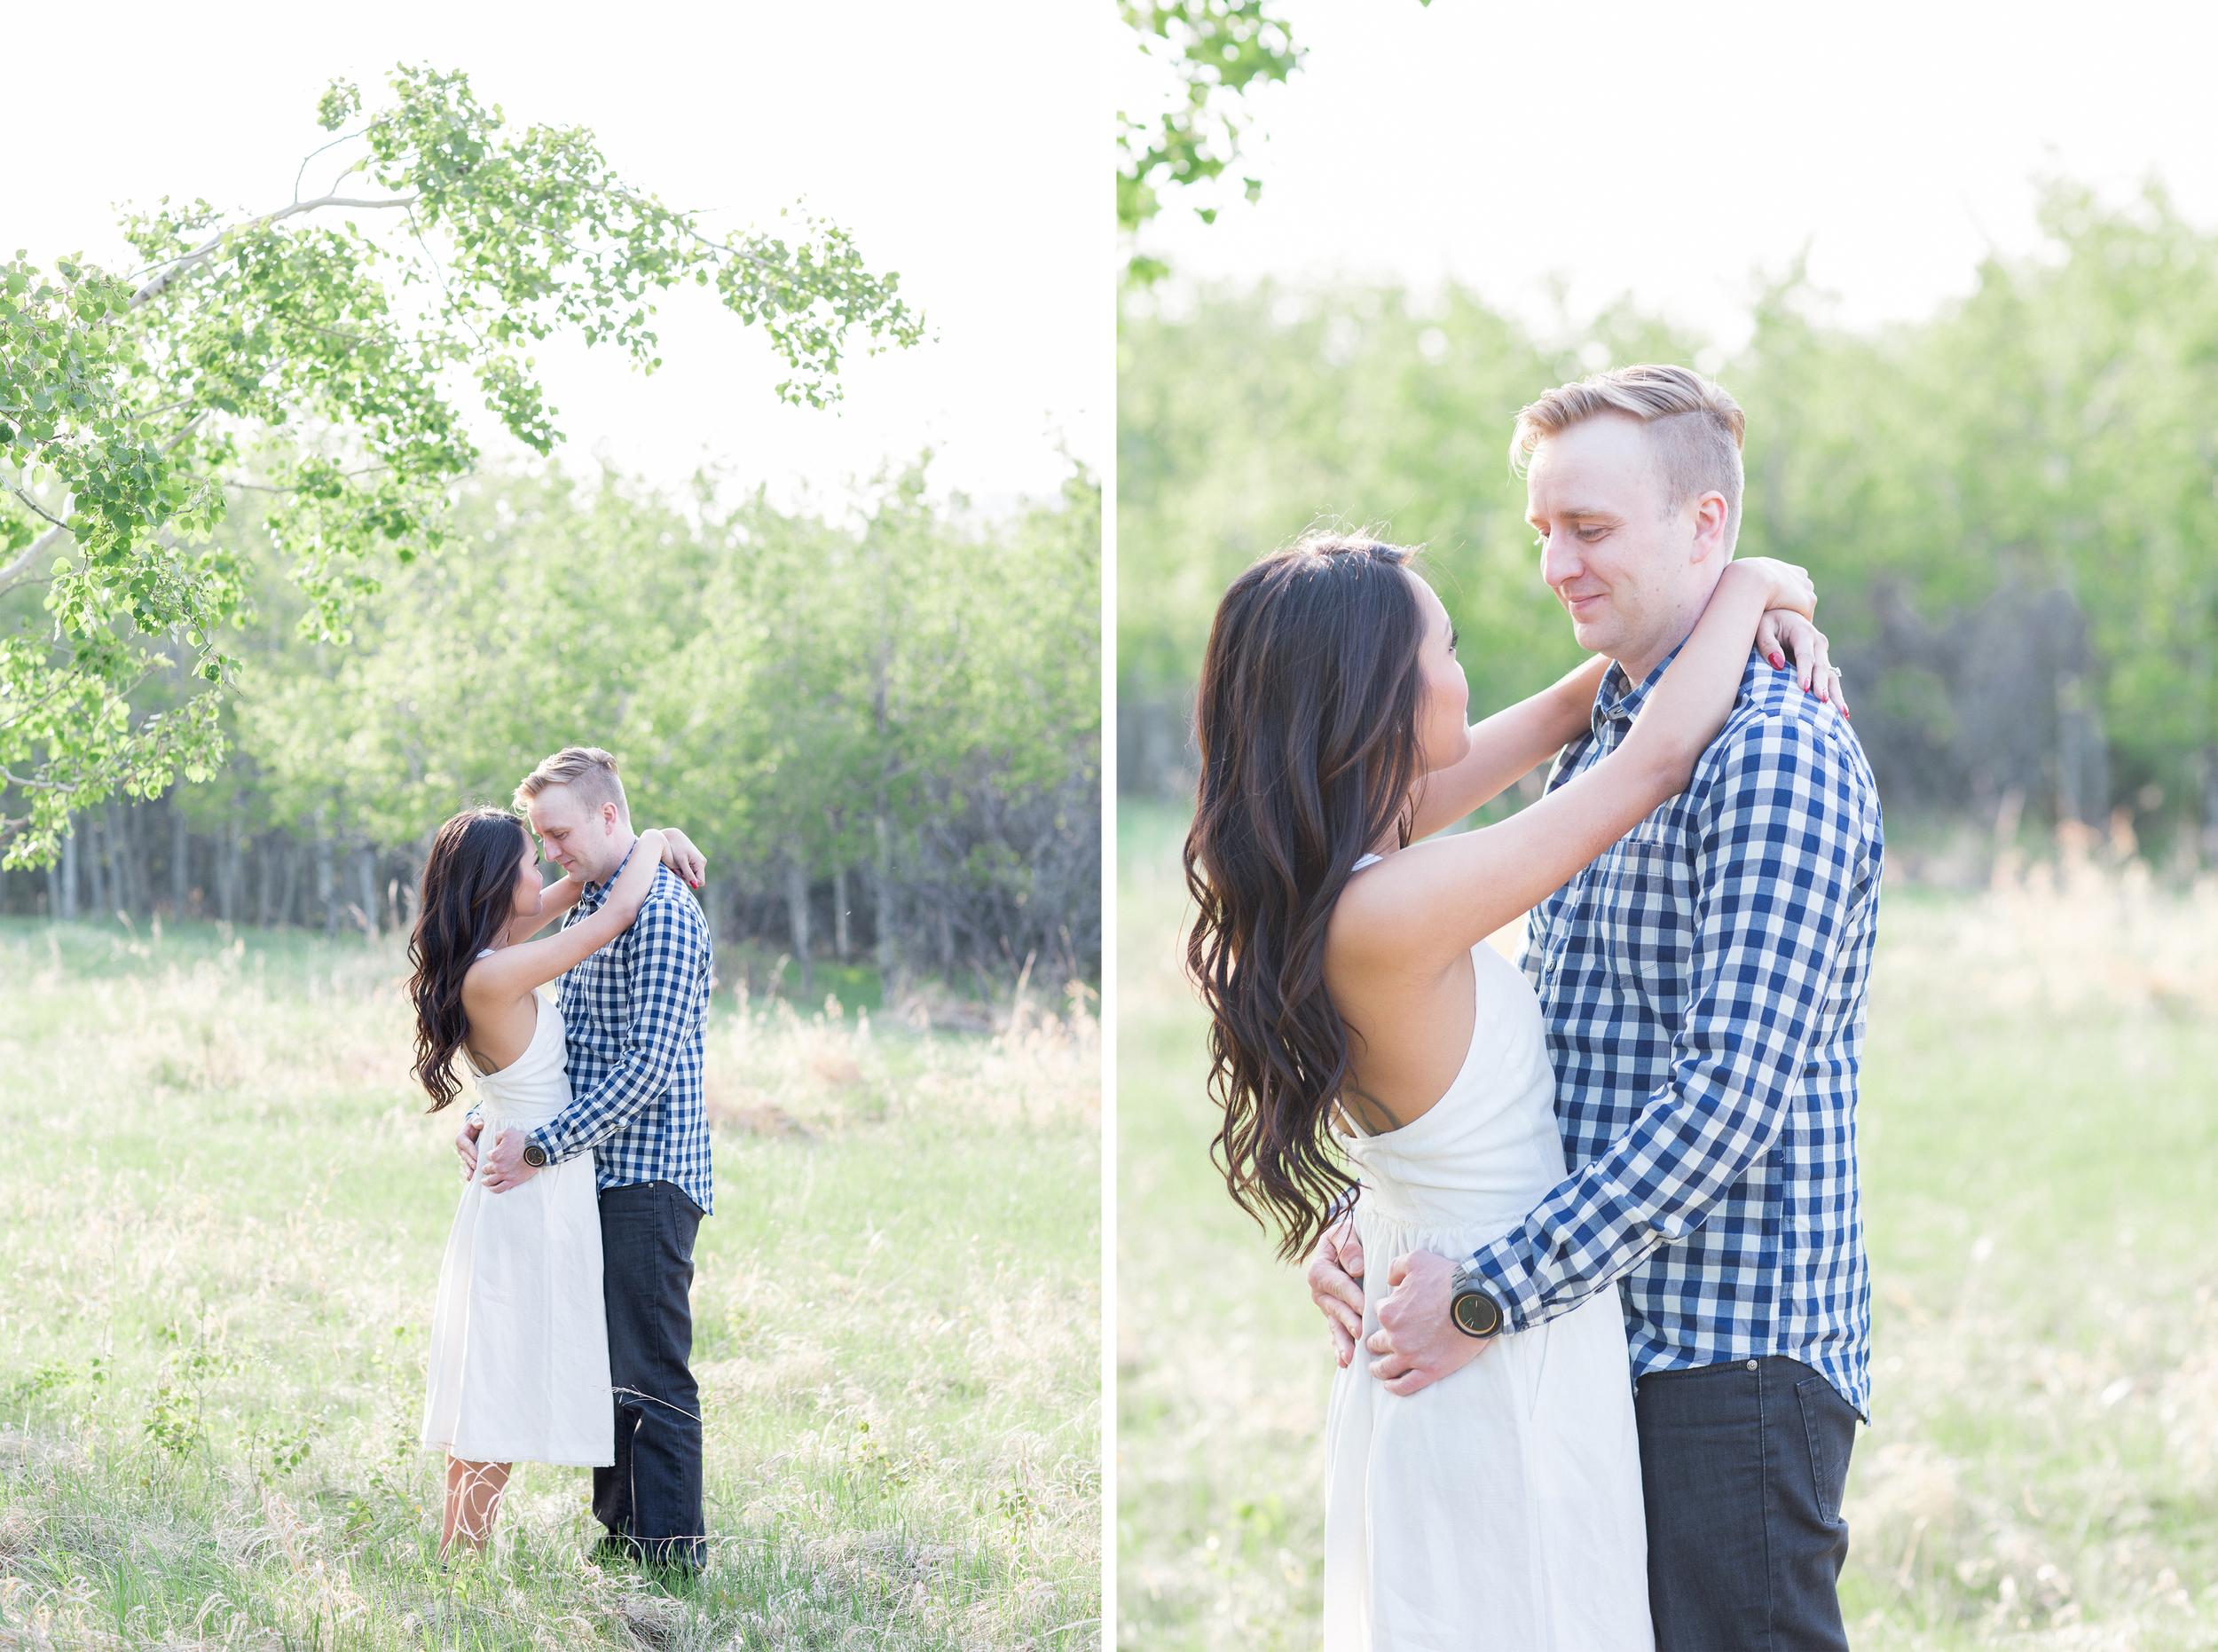 EngagementPhotography_ParrishHousePhotos_StefanieShawn_03_Set.jpg